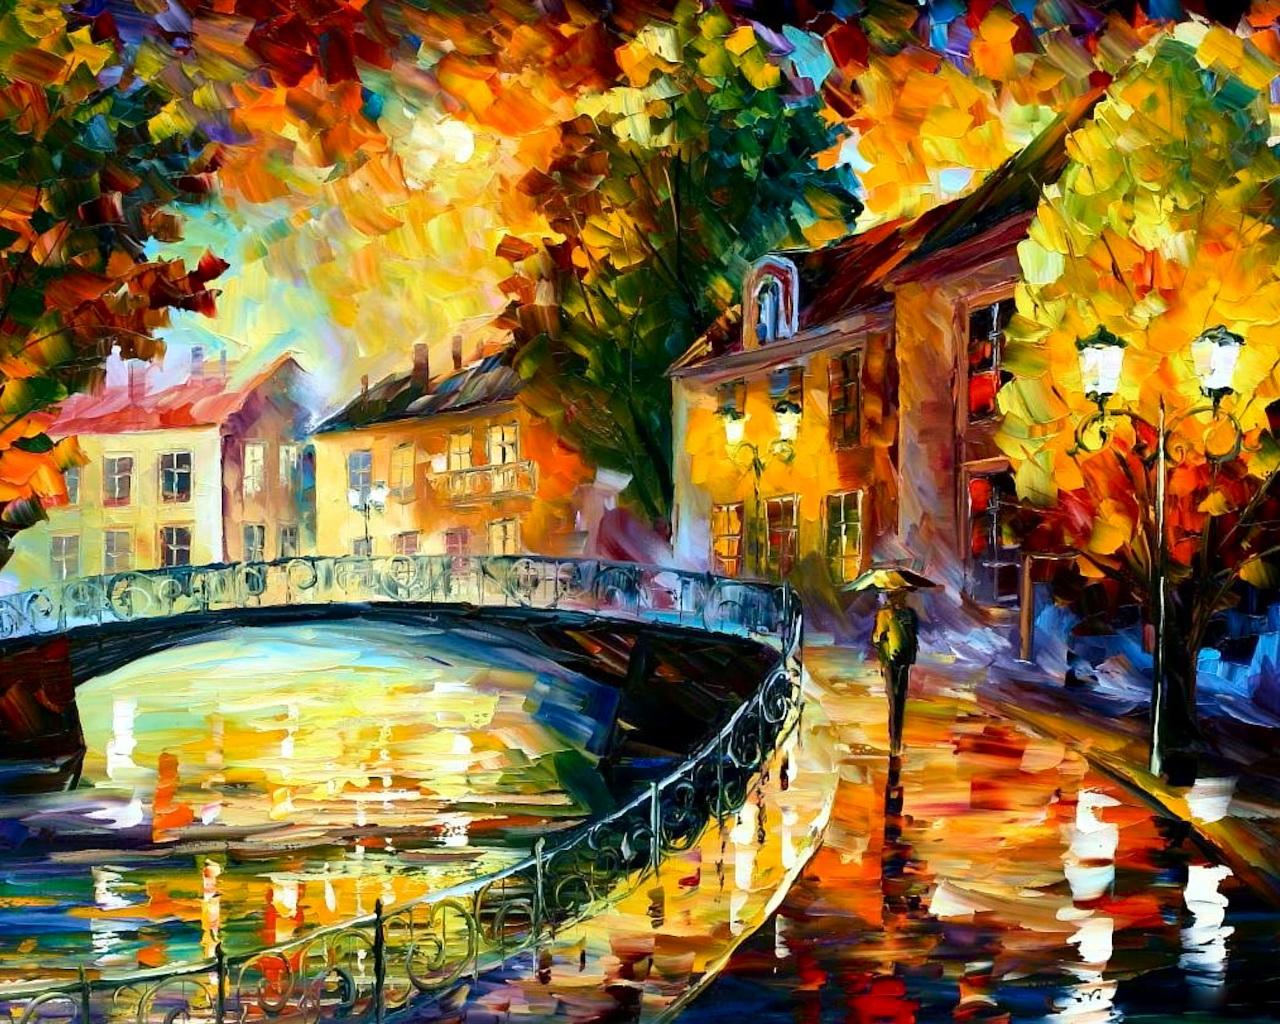 Best Wallpaper Base Best Painting Wallpaper 2 1280x1024